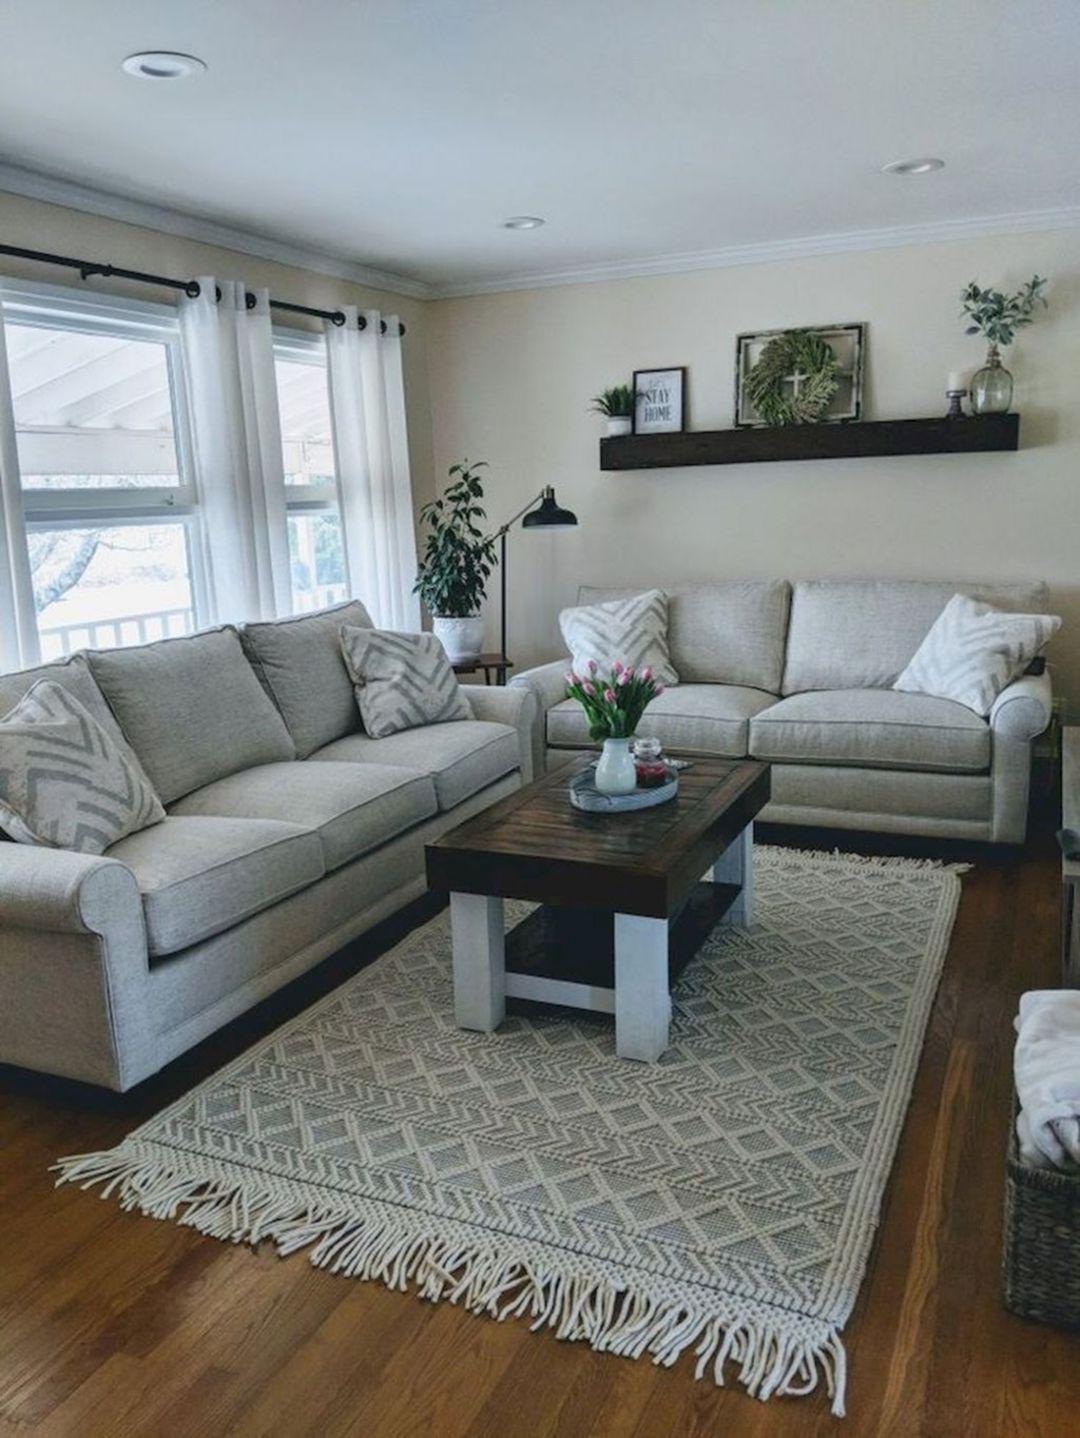 Small Modern Apartment Living Room Ideas: 15 Best Decor Ideas For Your Small Living Room Apartment